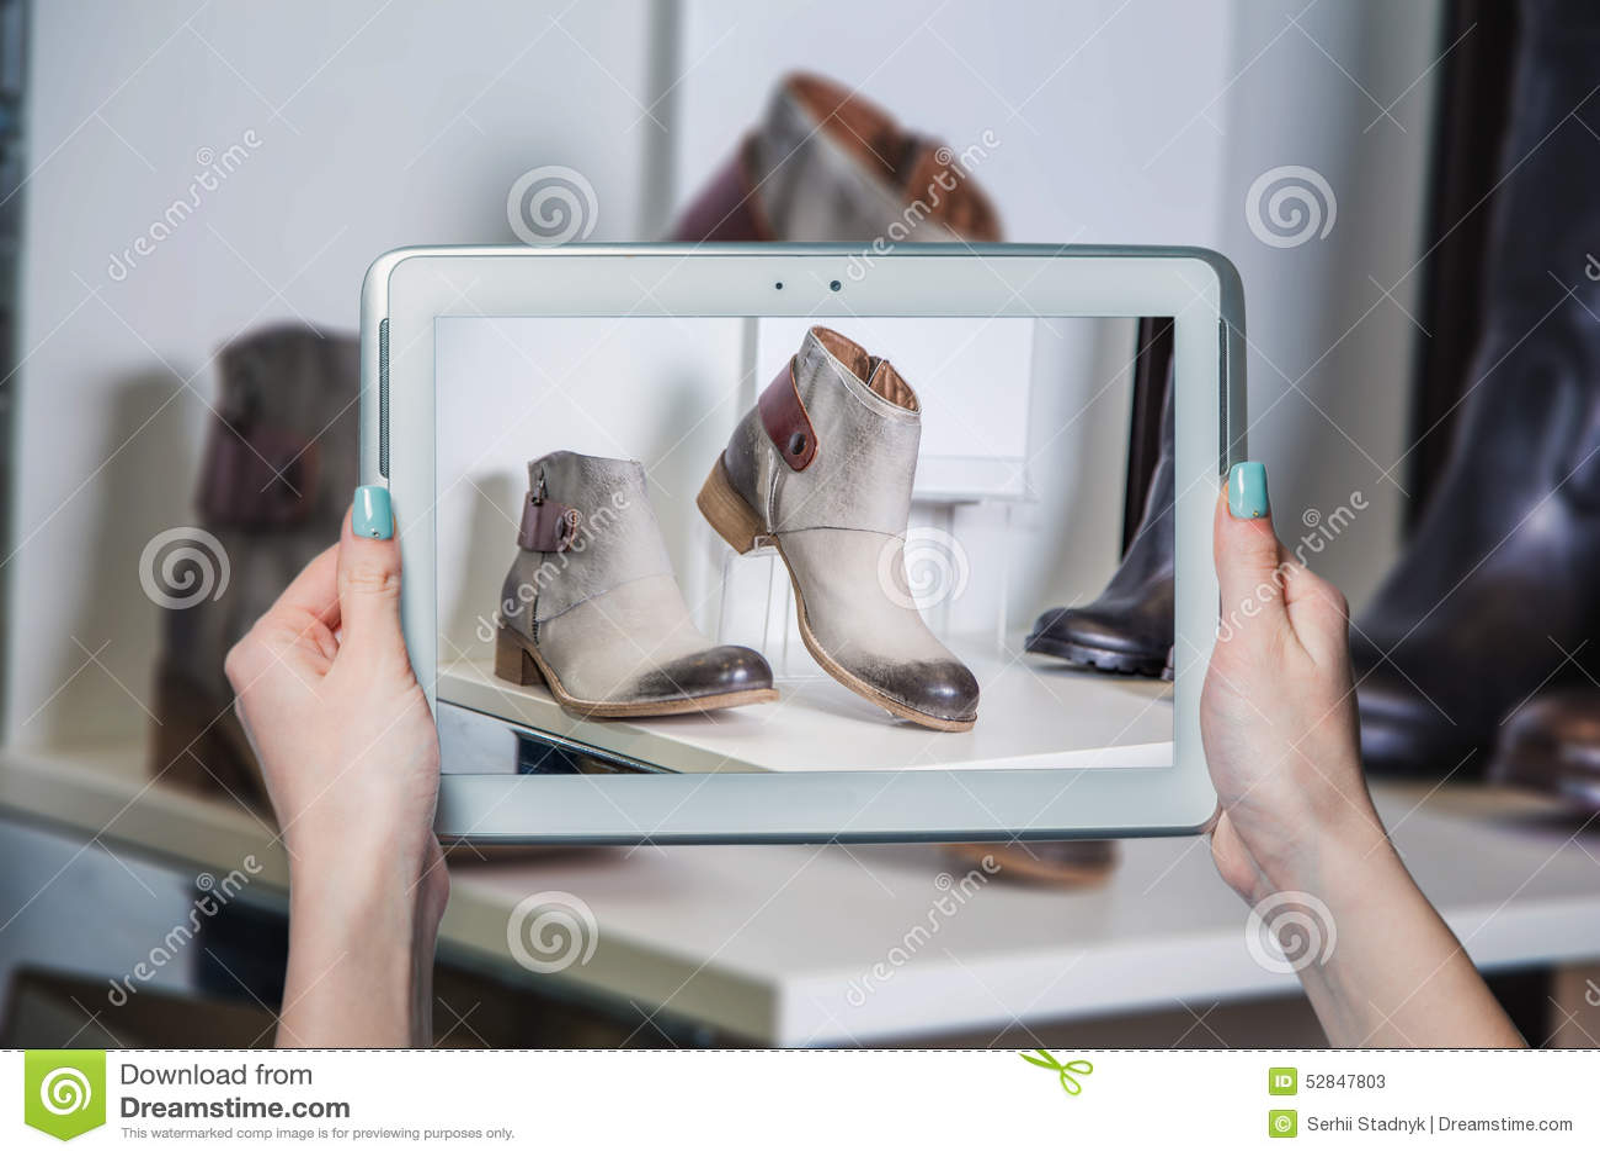 Stock Photo: Online shoe store, online sale